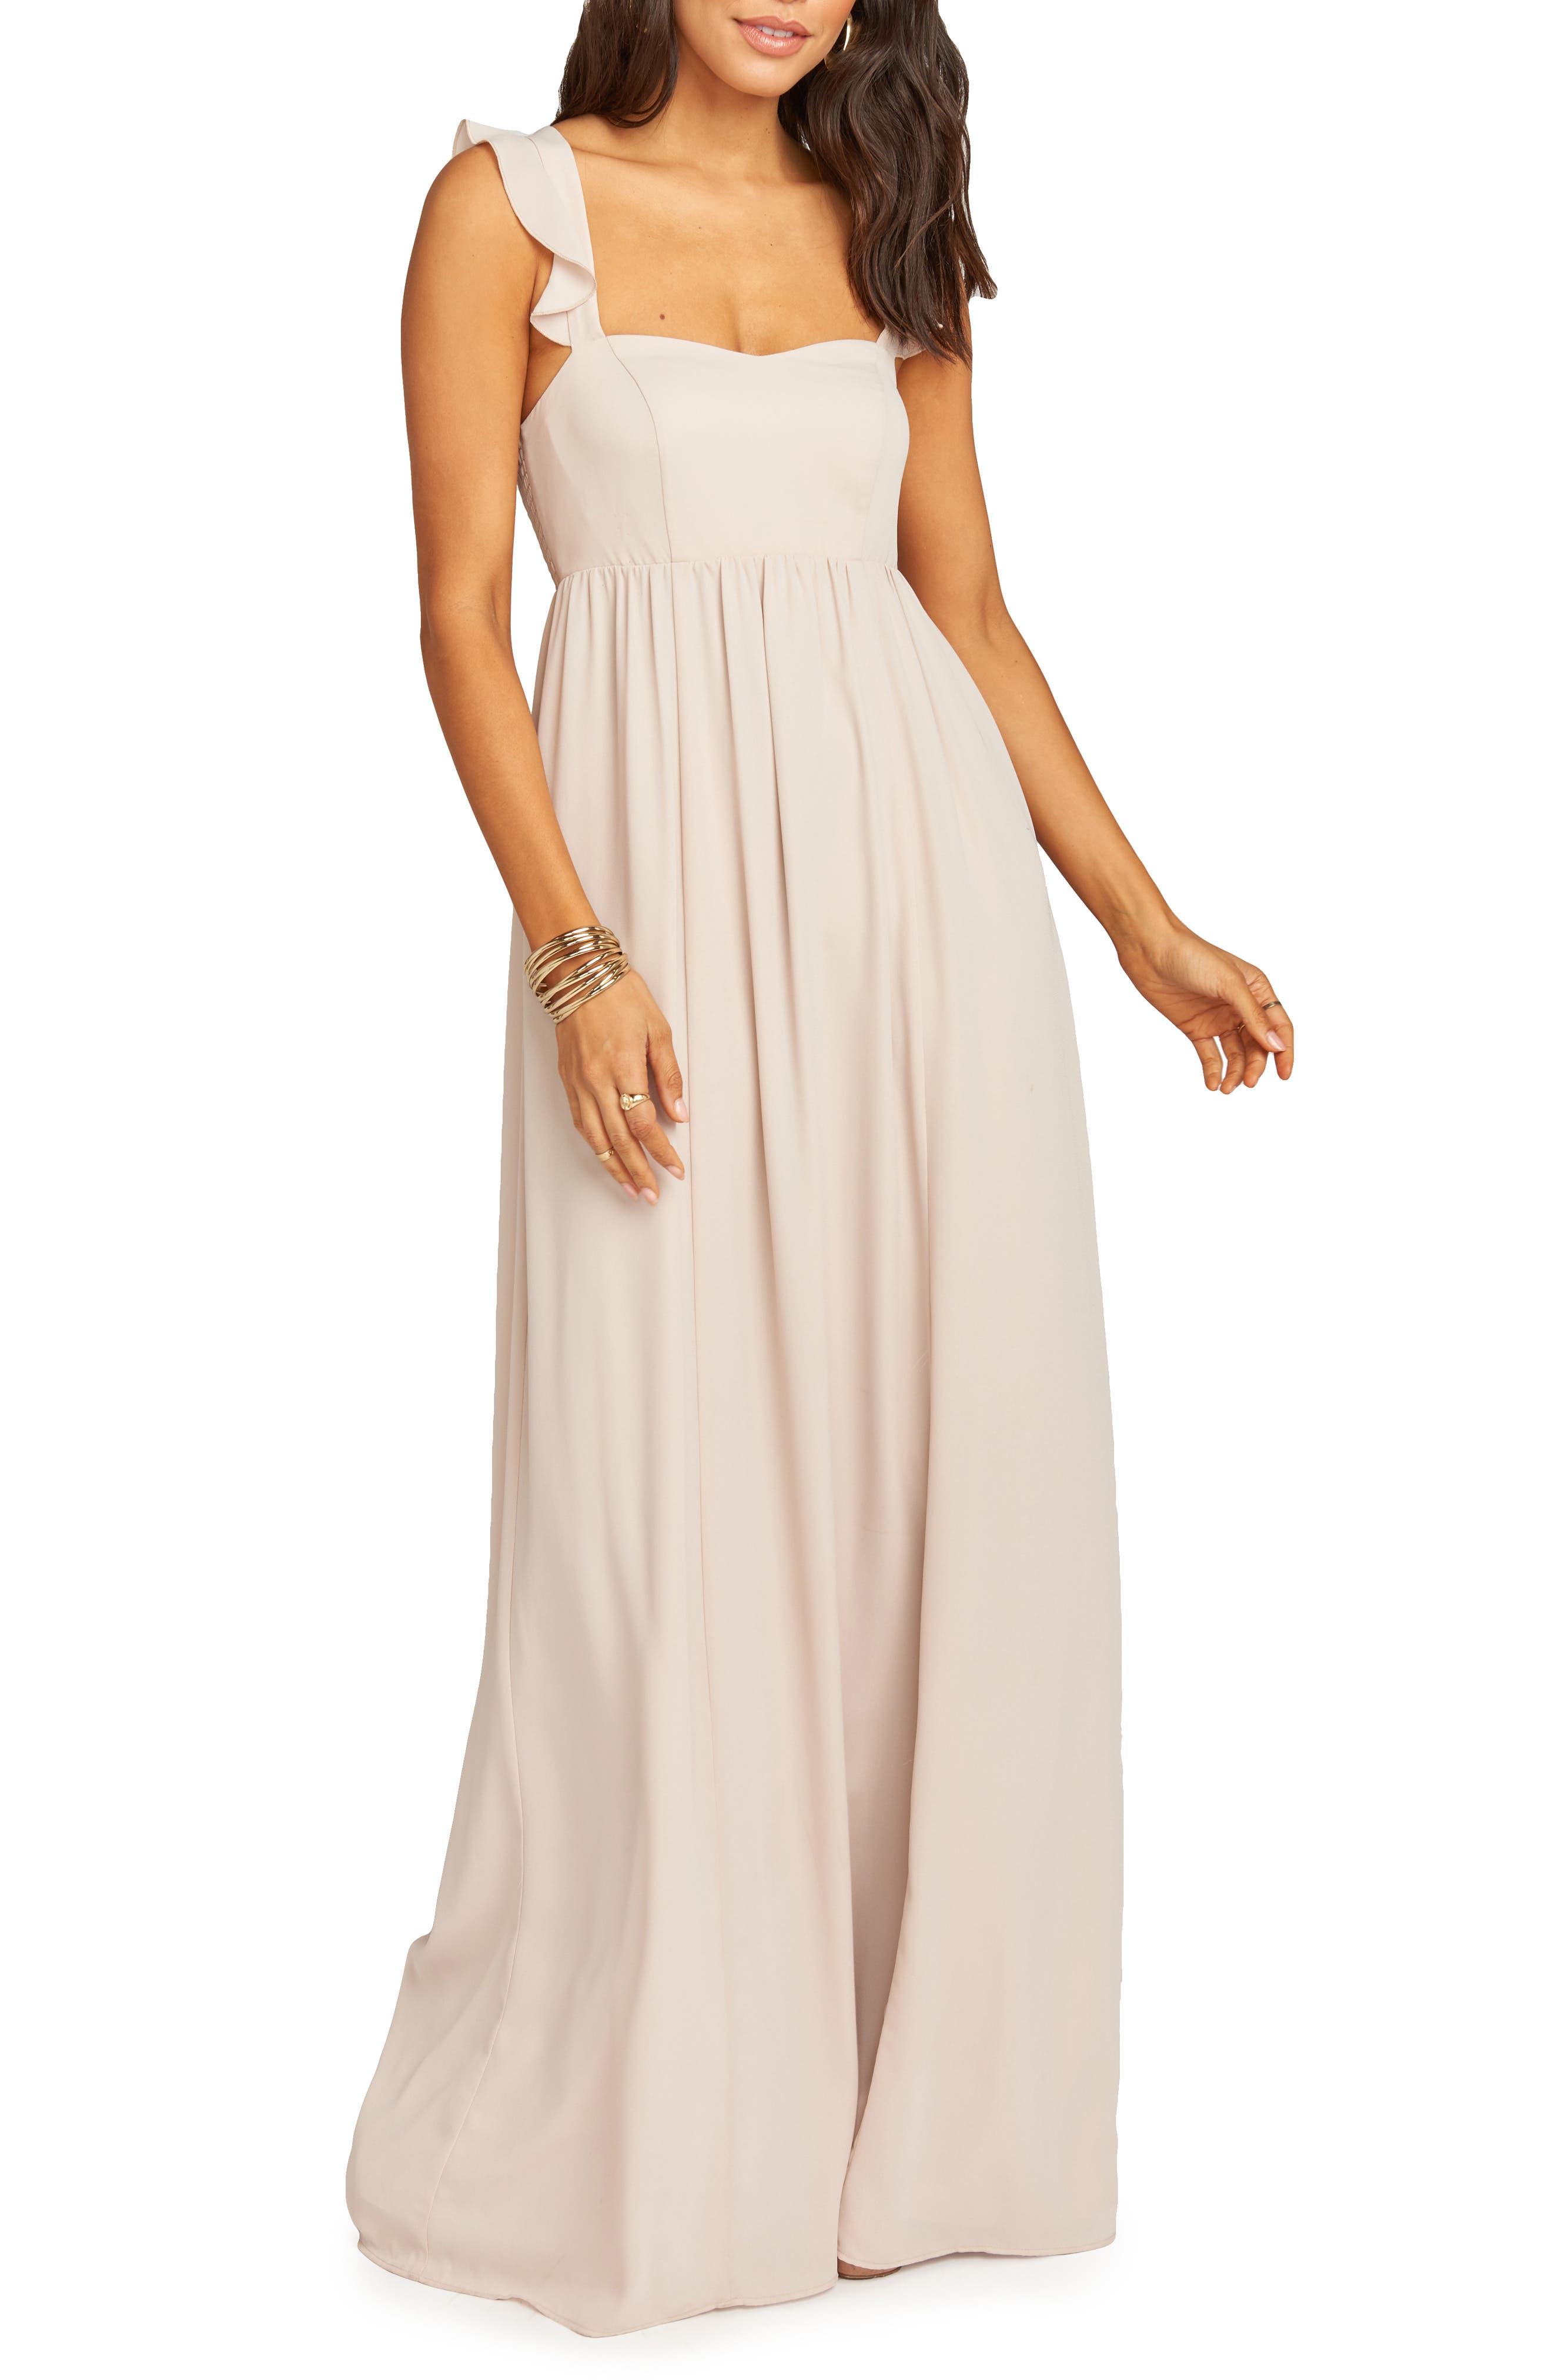 Show Me Your Mumu June Ruffle Strap Evening Dress, Beige